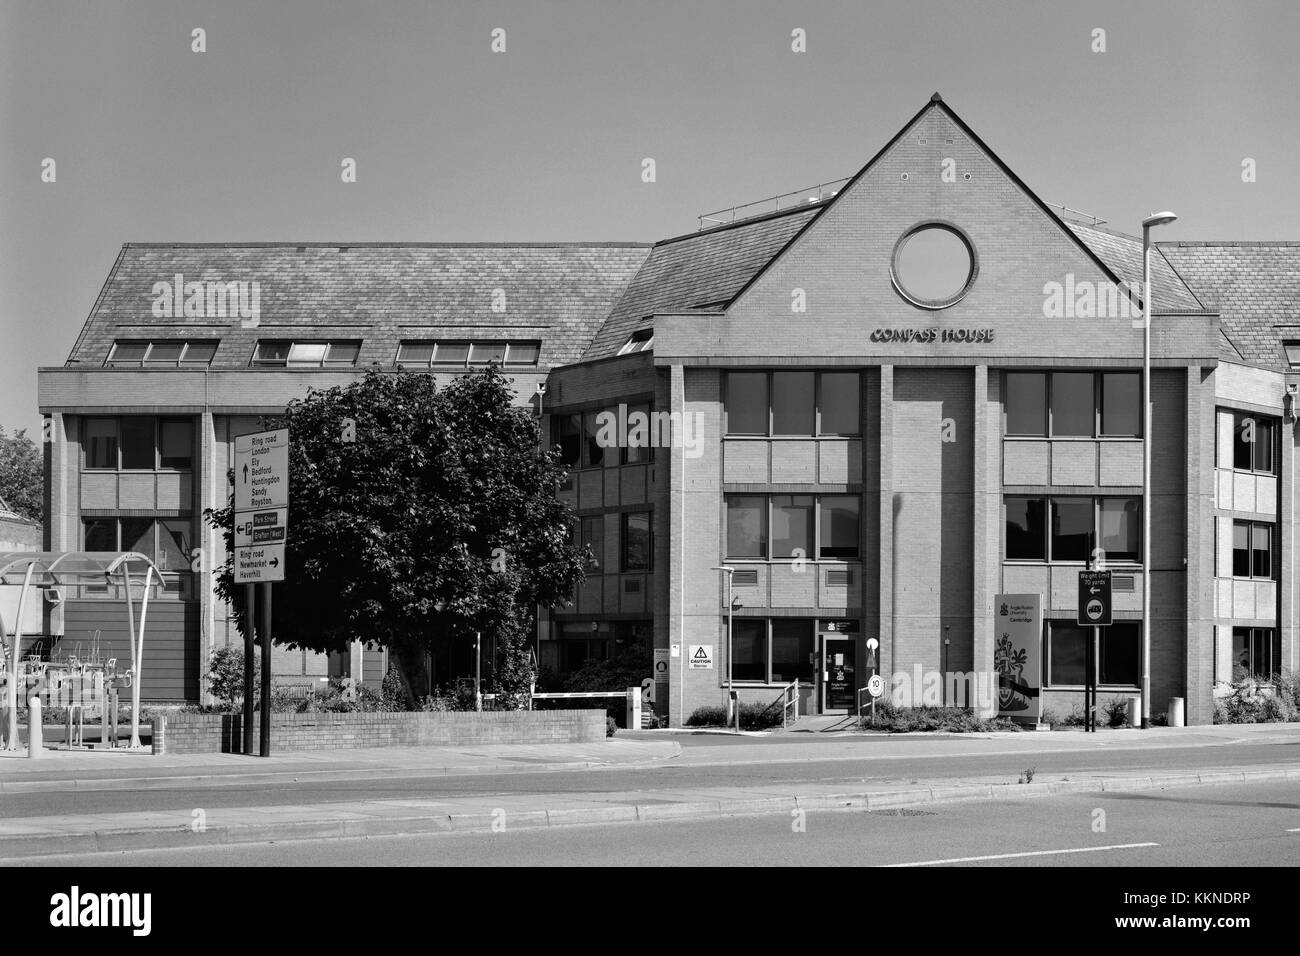 Compass House of Anglia Ruskin University, East Road Cambridge - Stock Image